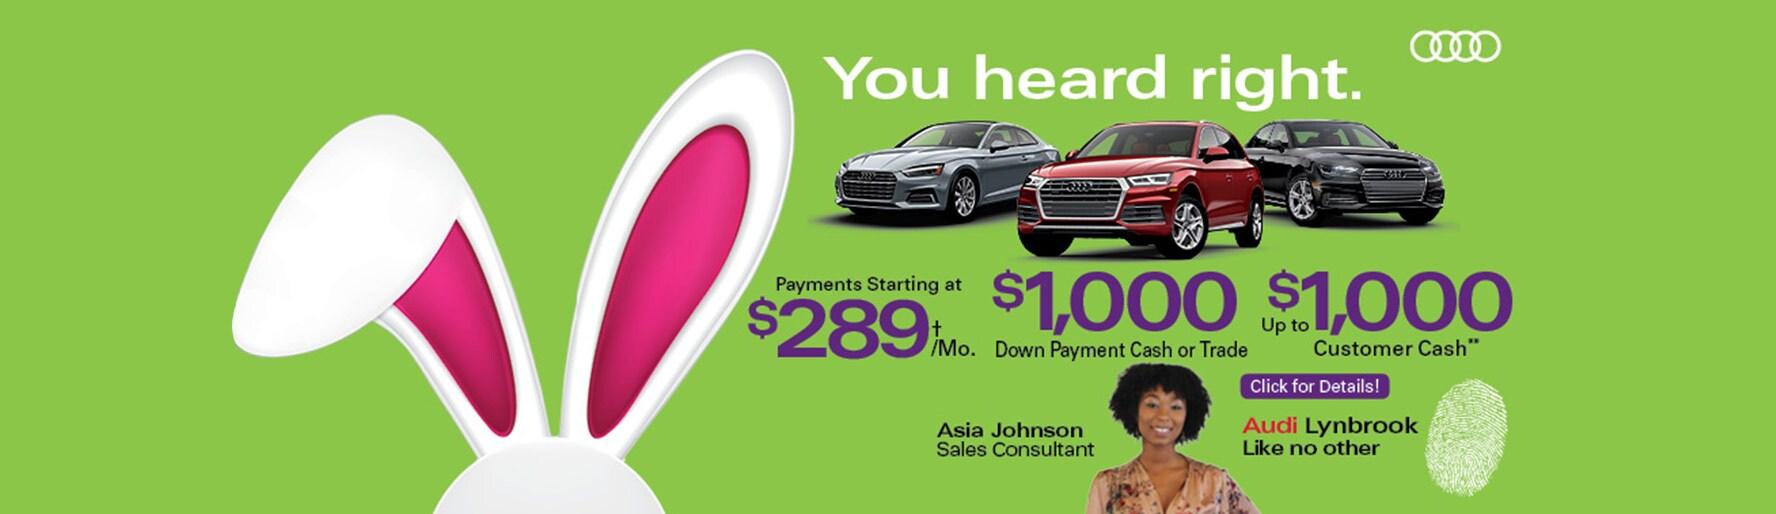 New Used Audi Cars Audi Lynbrook NY Audi Dealer - Audi dealer long island